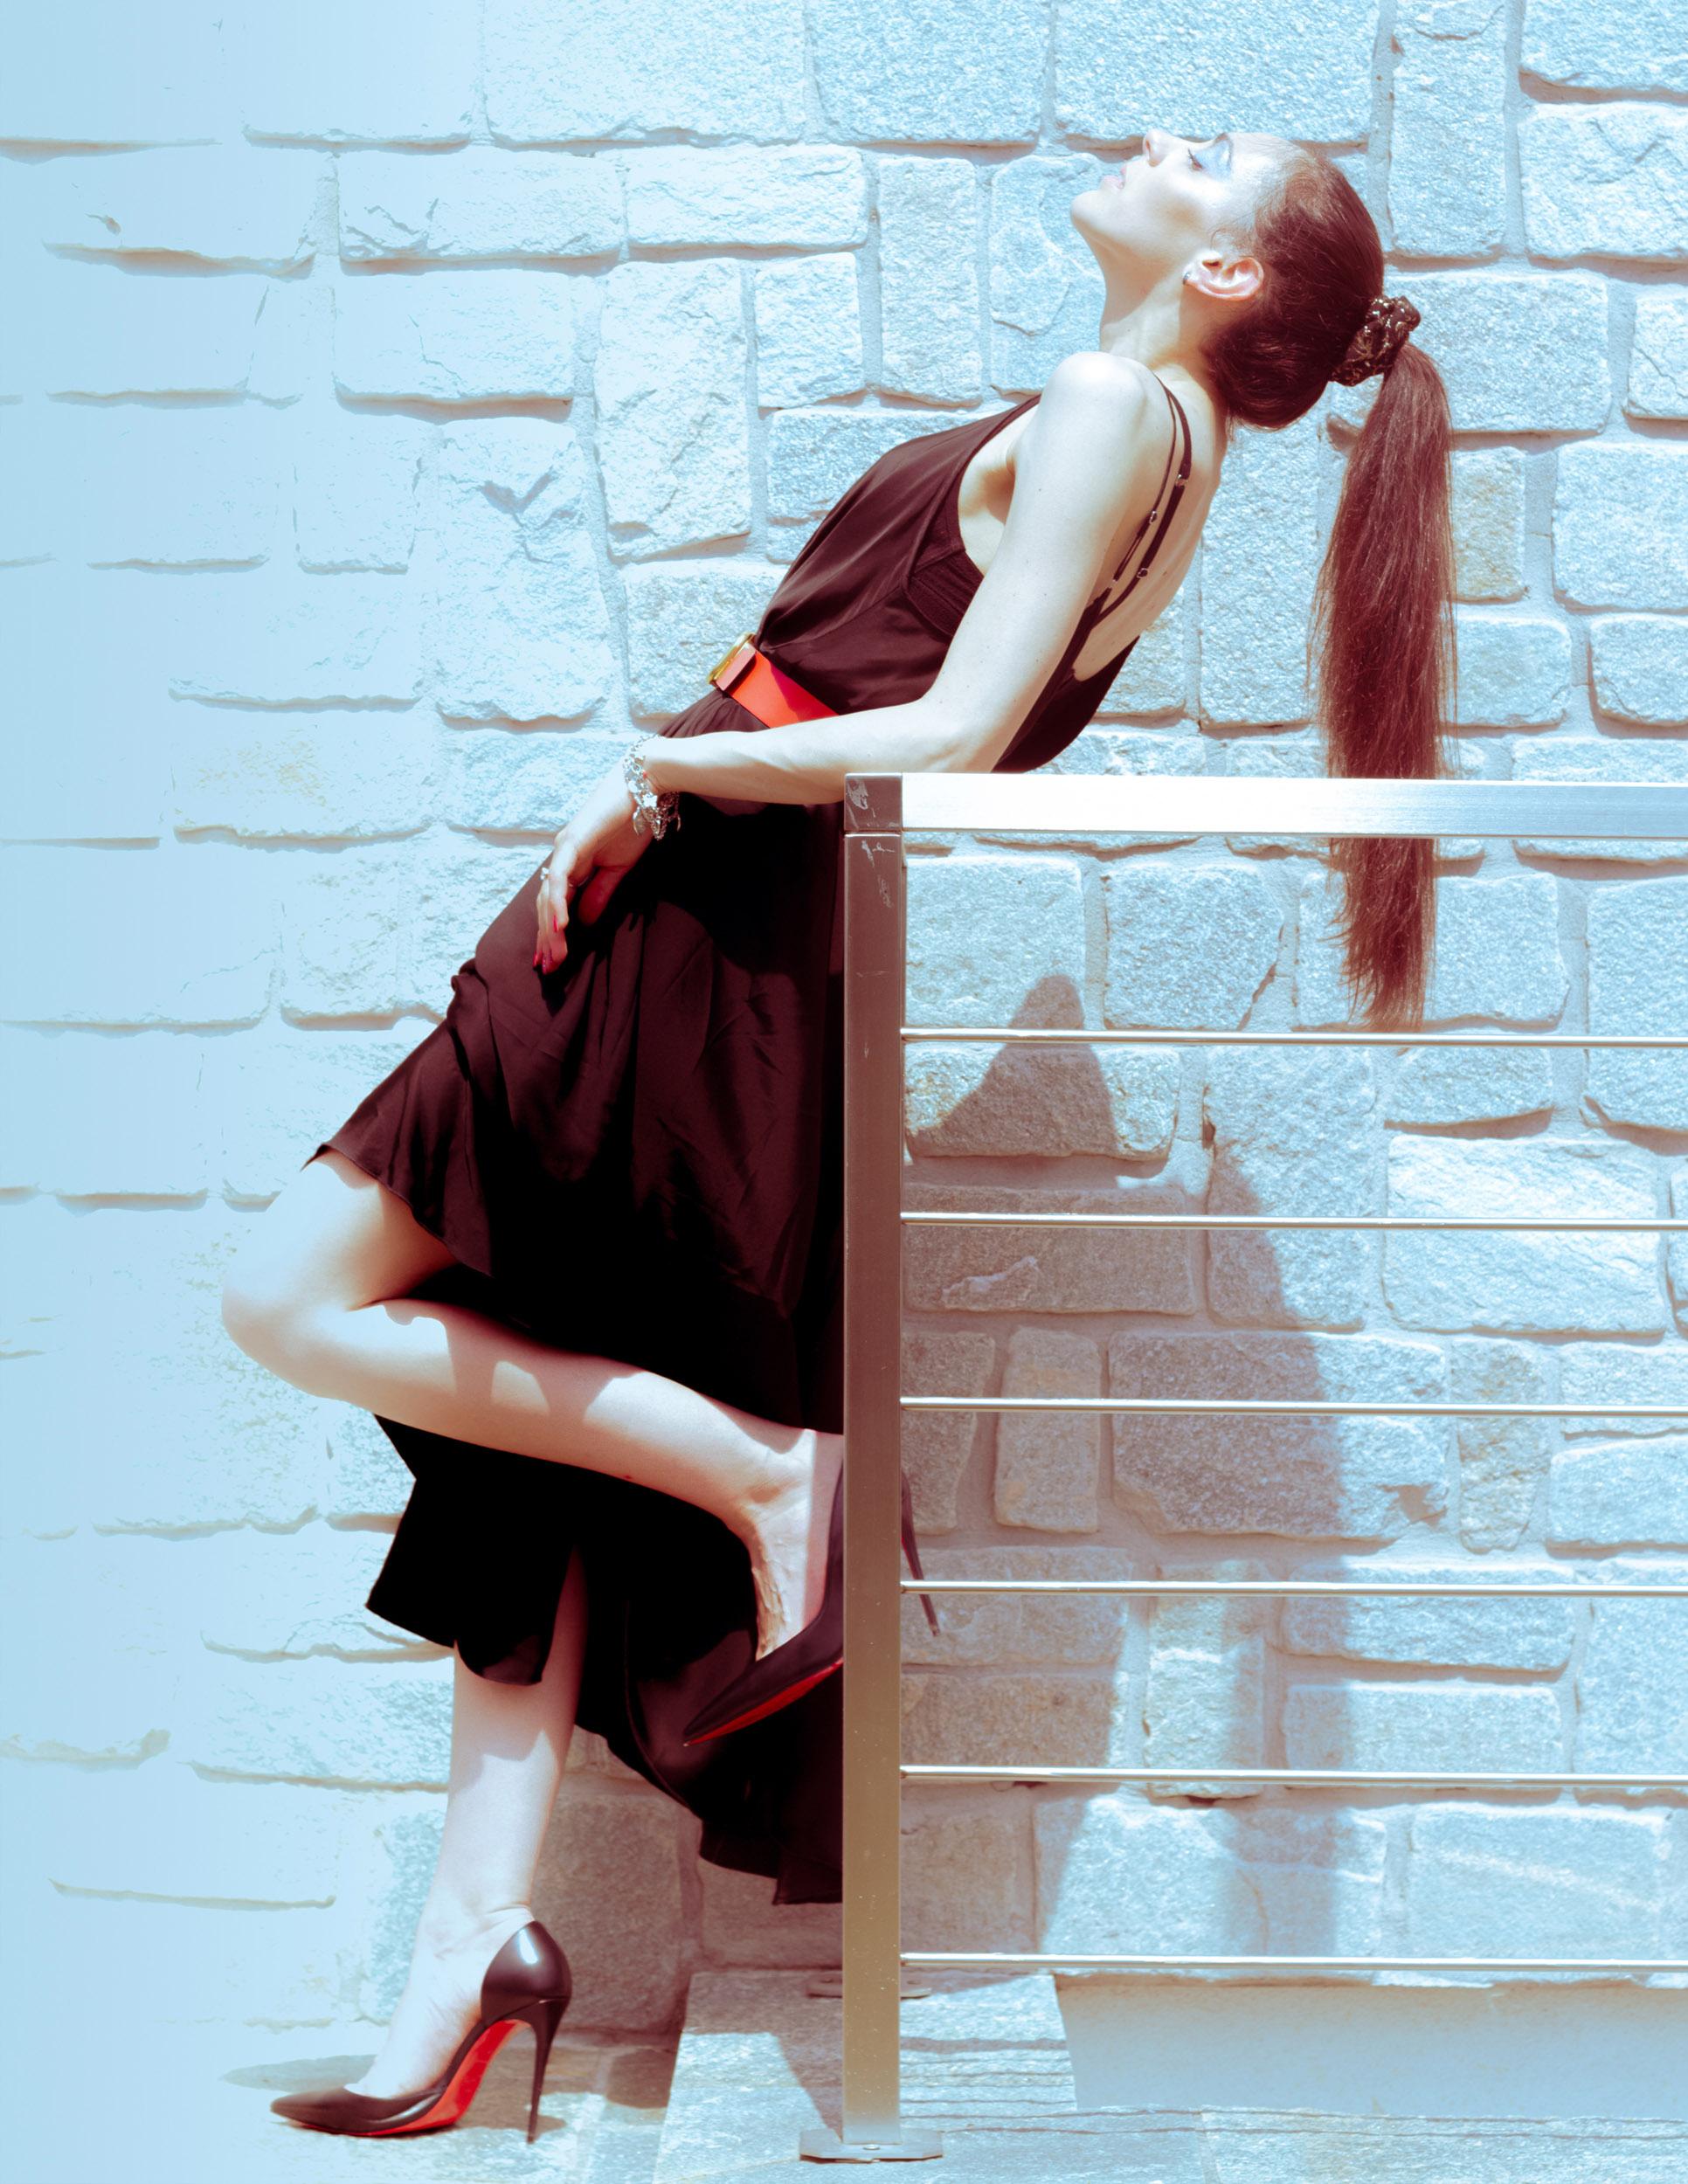 Categorie: Portrait, Glamour - Ph. ANTEA FERRARI - Model: ALESSANDRA SIRTORI - Location: Viganò, LC, Italia